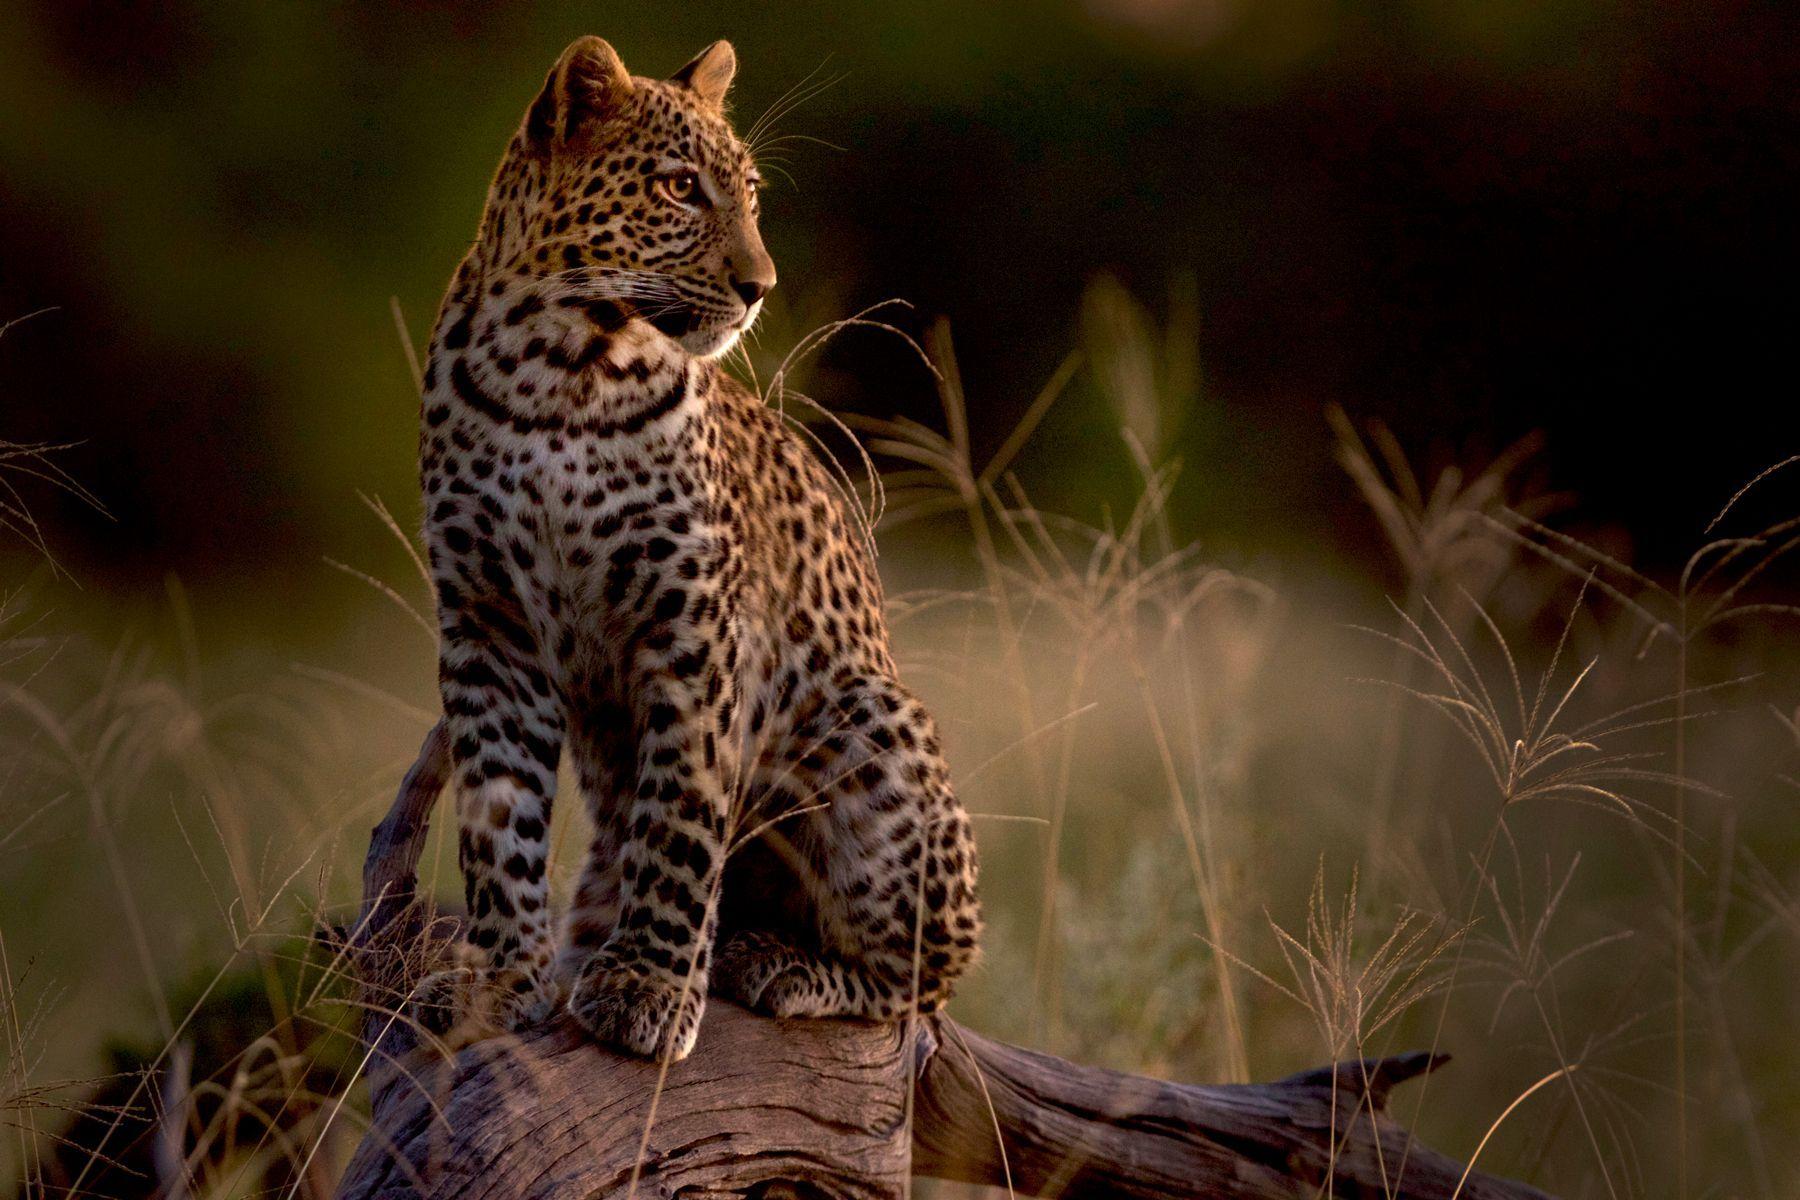 A Leopard at sunset at Khwai, Botswana